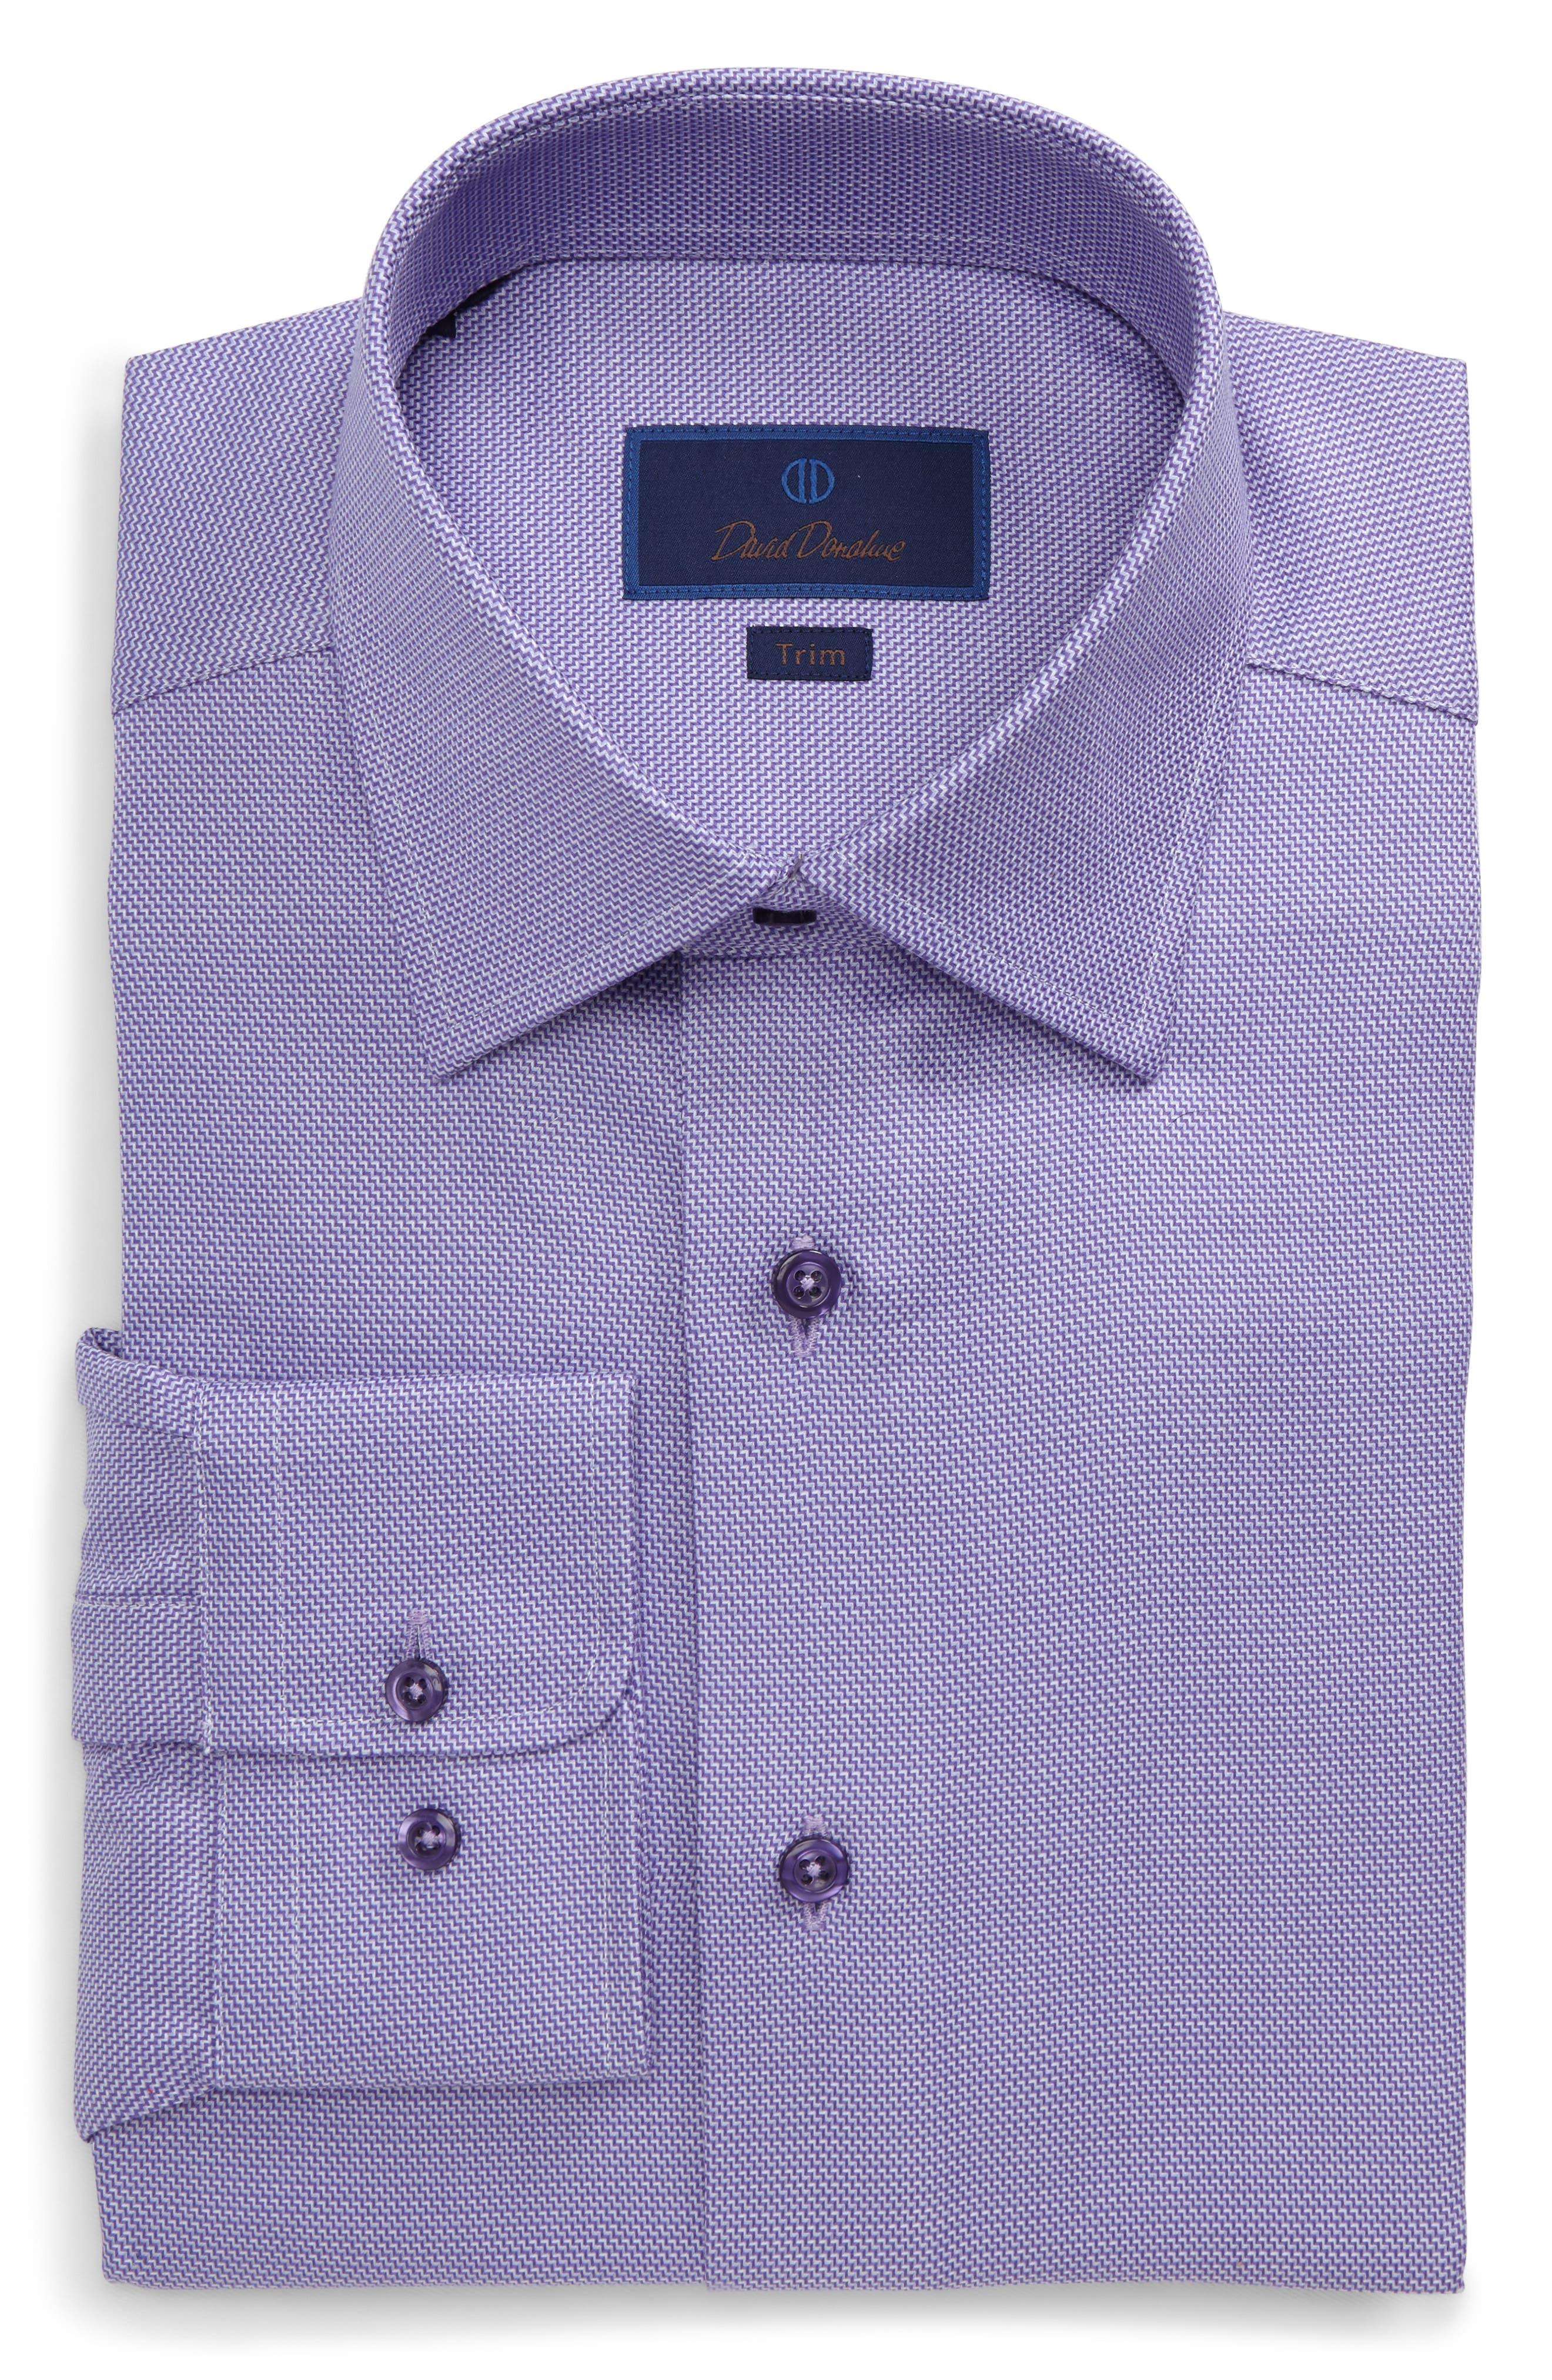 Trim Fit Solid Dress Shirt,                             Main thumbnail 1, color,                             LILAC